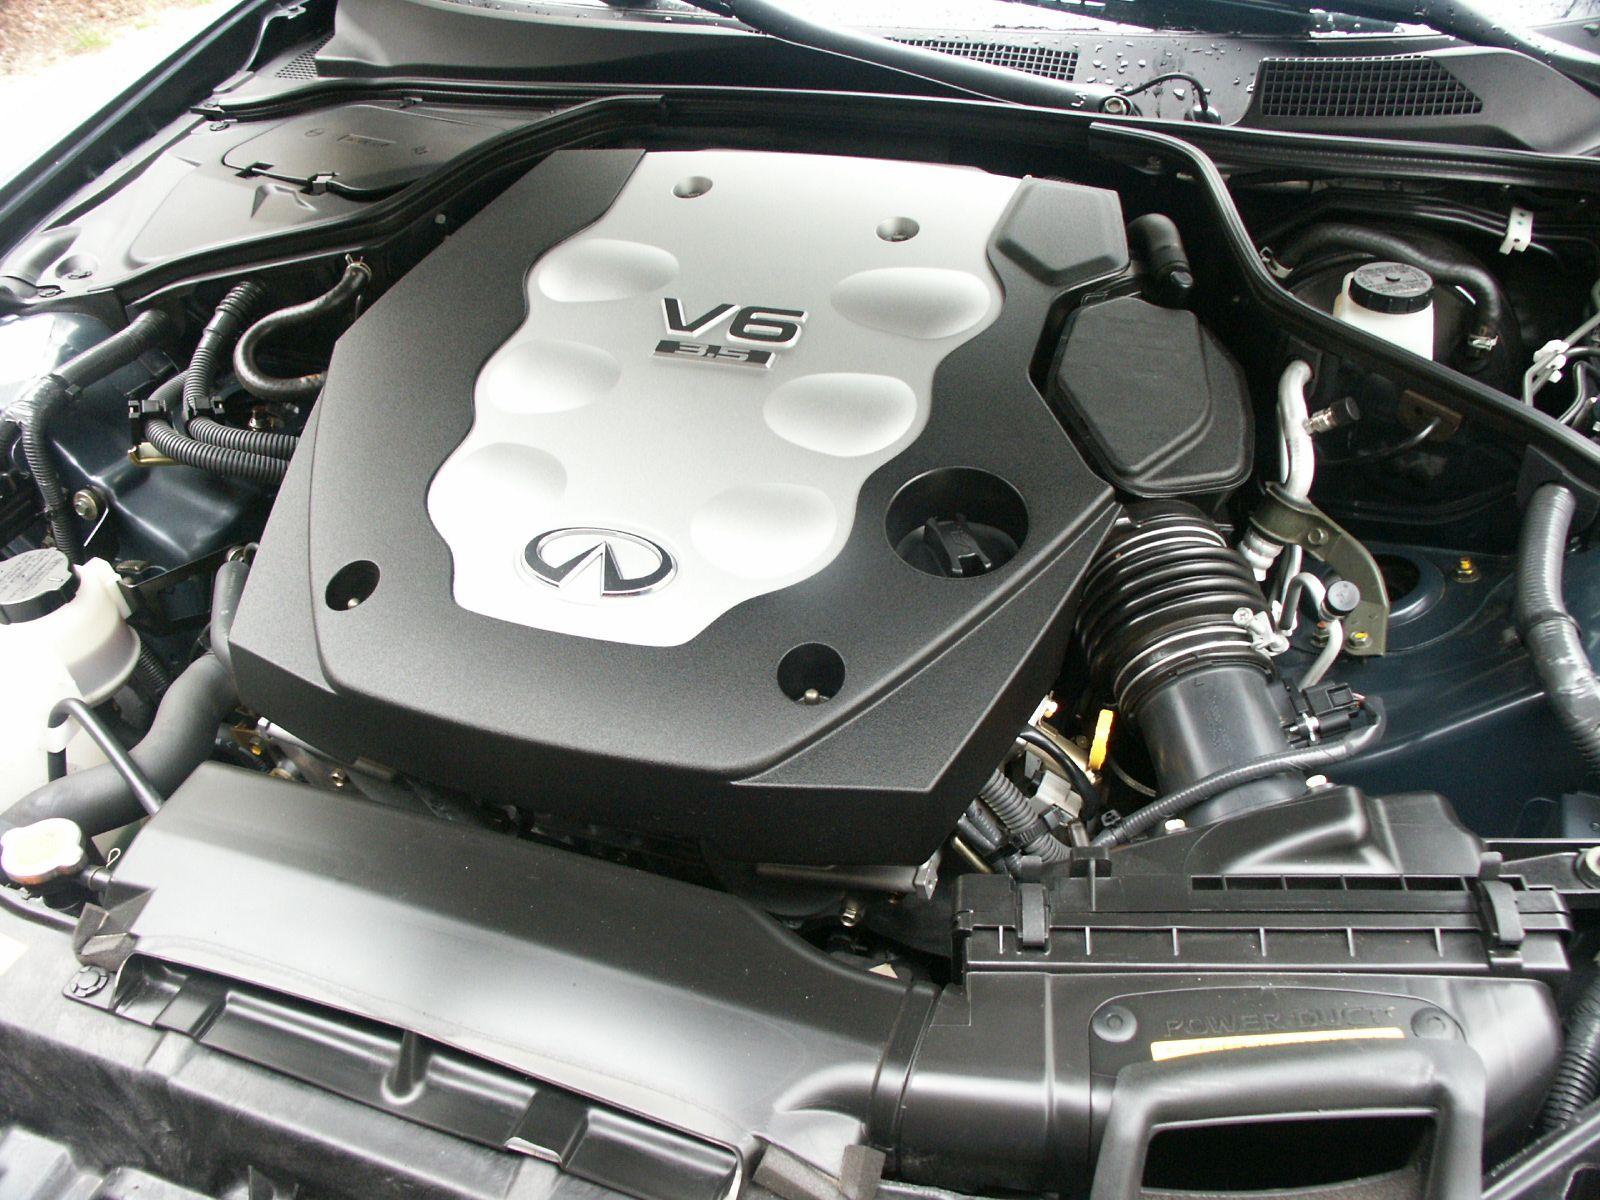 2008 Infiniti Ex35 Used Engine Description Gas Riv 3 5l Vin A Auto Flr Awd Fits 4th Digit Vq35hr V6